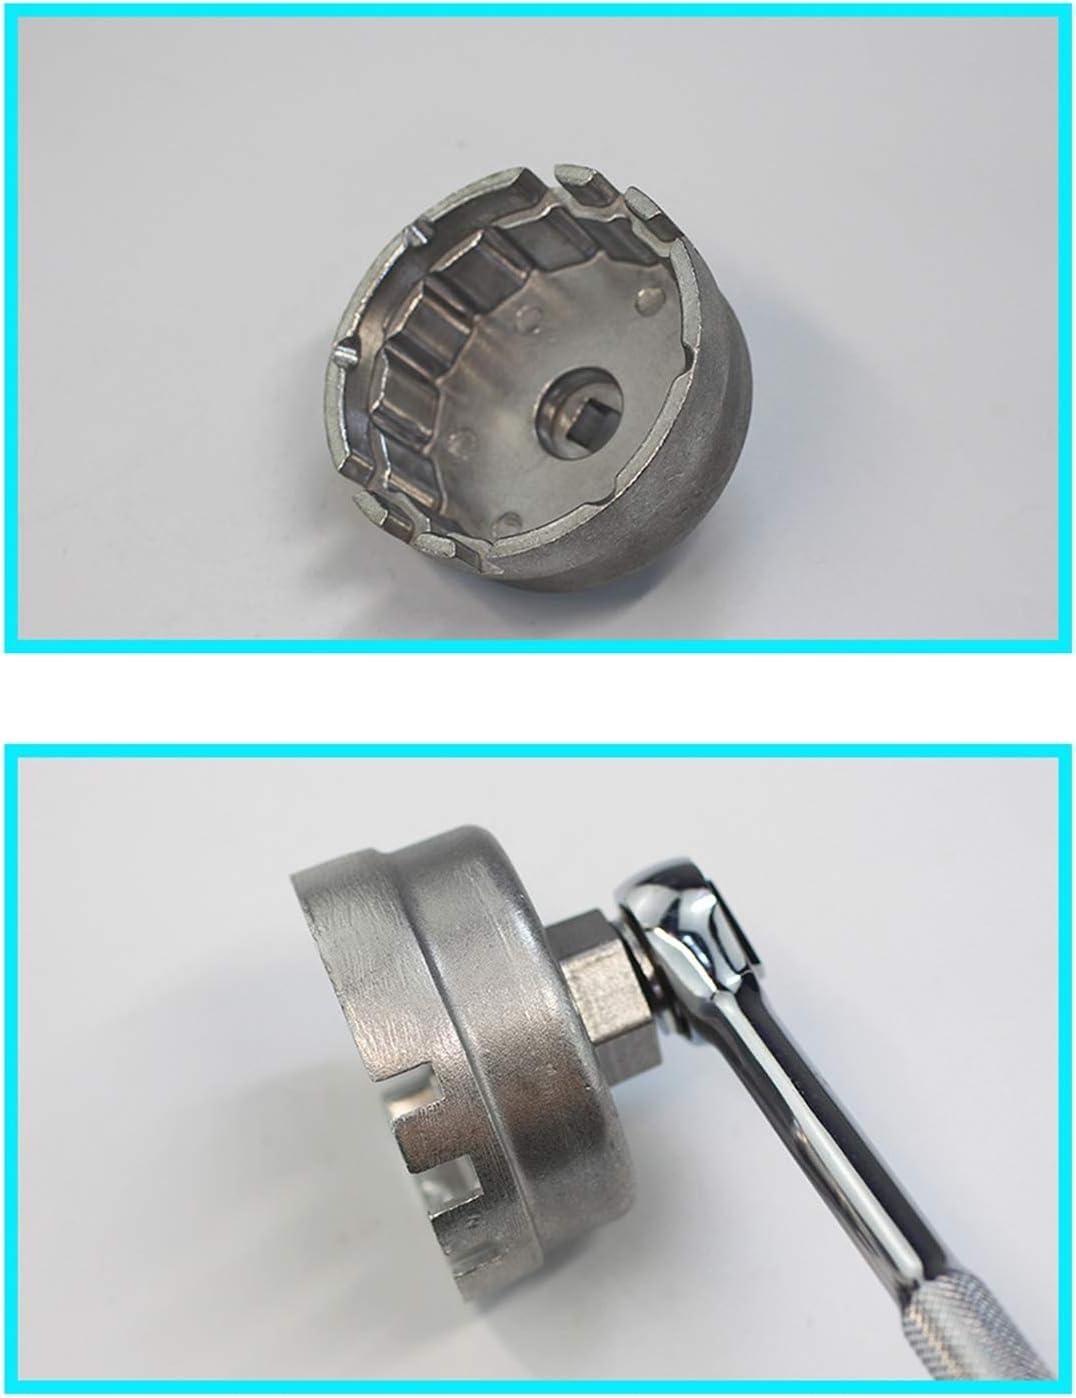 Aluminum Alloy Oil Filter Wrench Cap Housing Tool Remover 64.5mm 14 Flutes 6 Openings for Toyota Prius Corolla Rav4 Auris